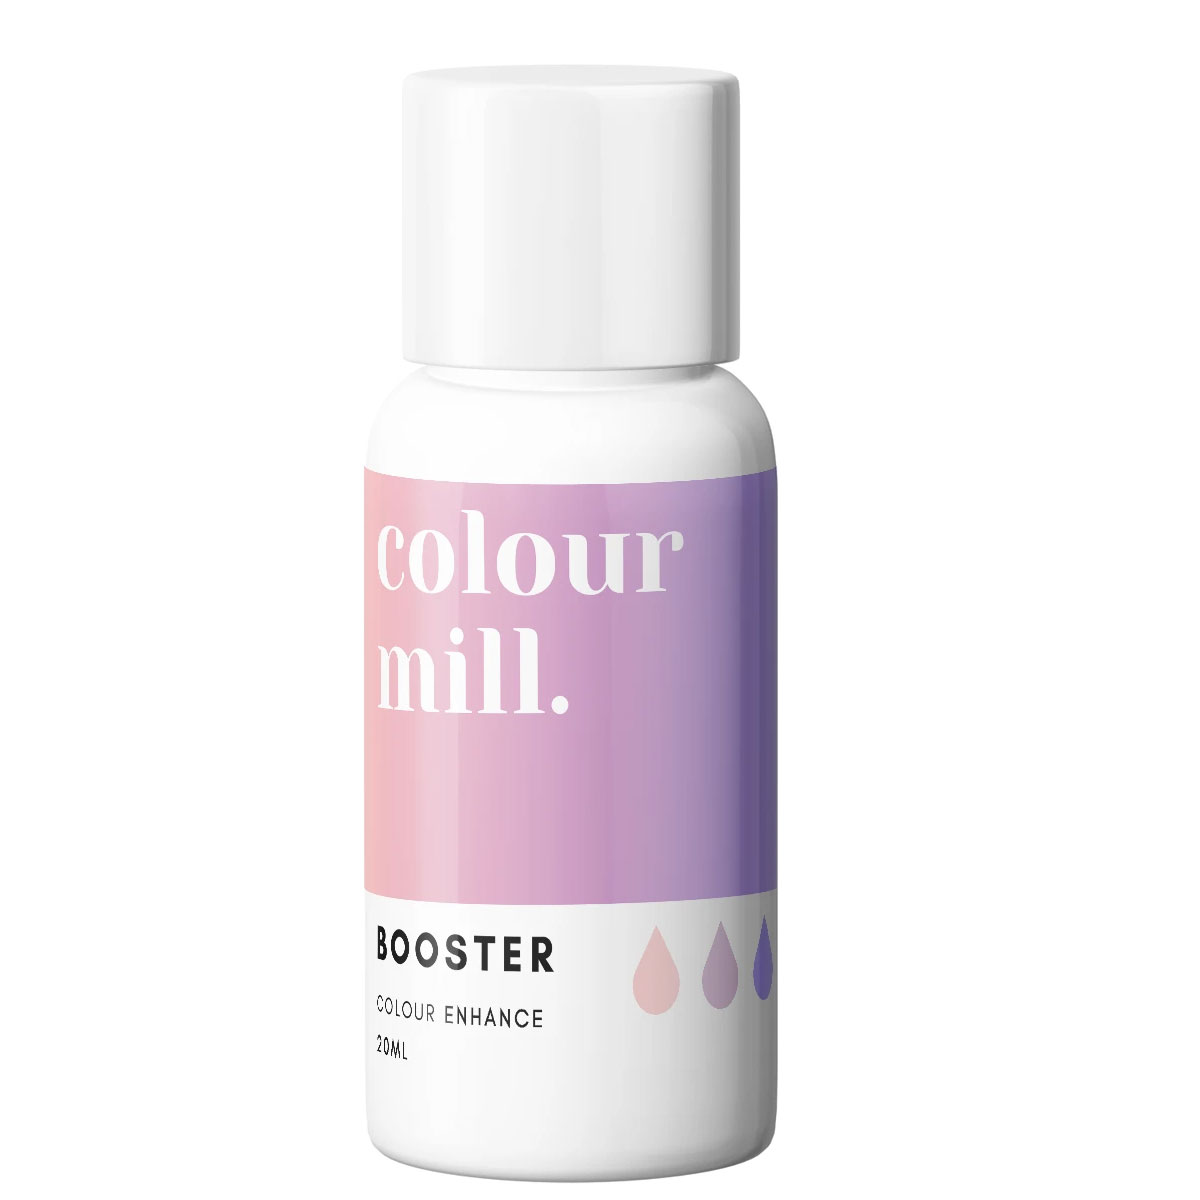 Colour Mill BOOSTER Farbverstärker 20ml